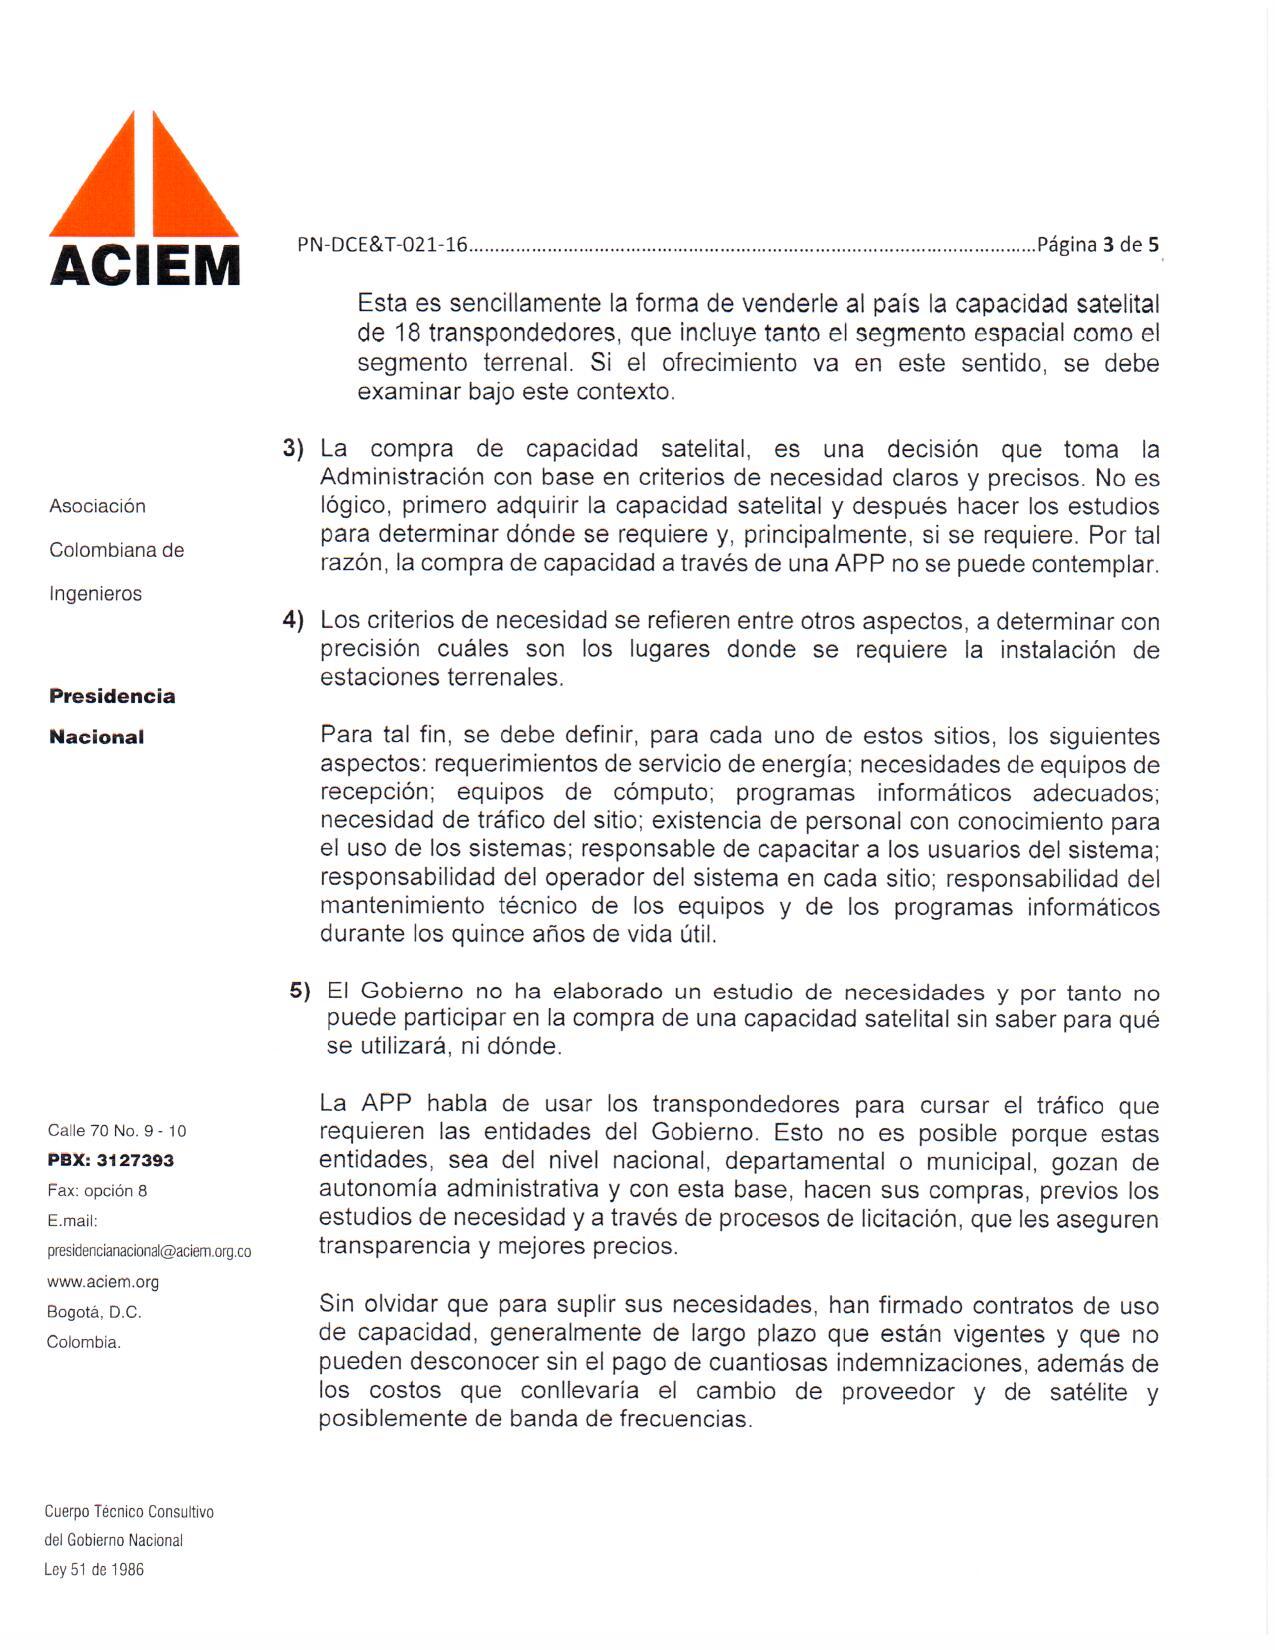 ACIEM a MINTIC. Análisis frente a APP Satelital (1)_Página_3